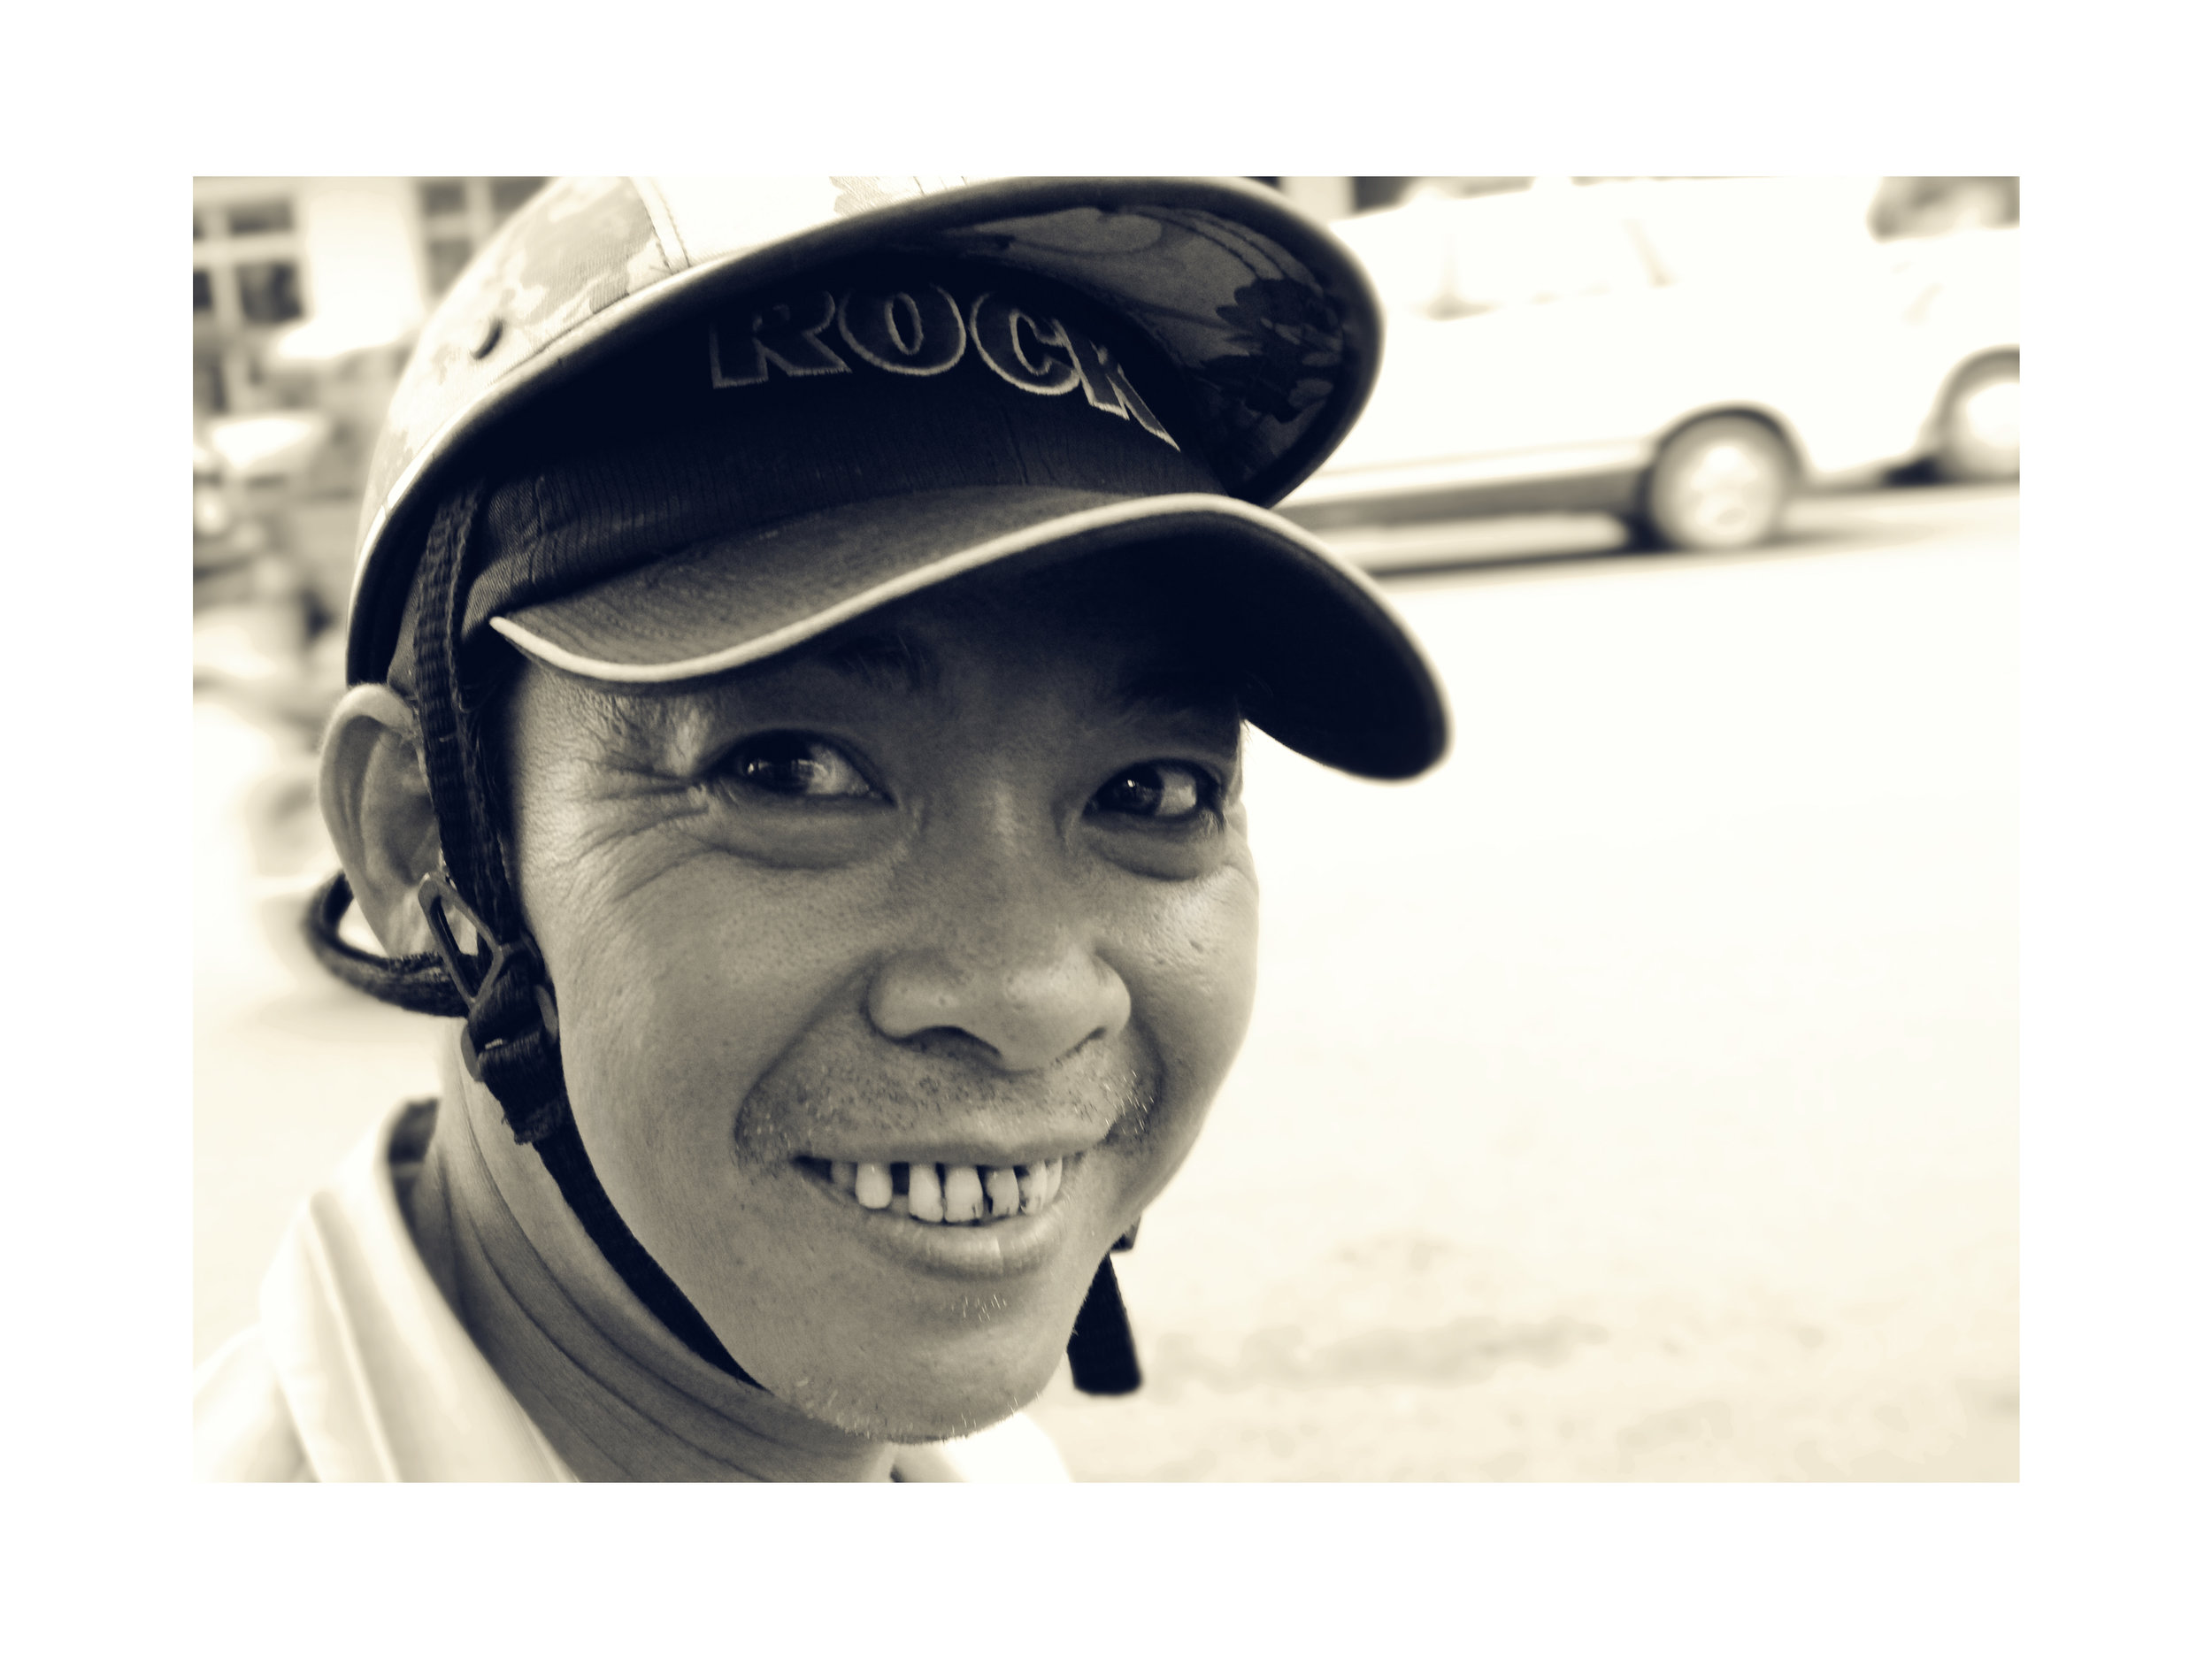 JW_face VI_006.jpg